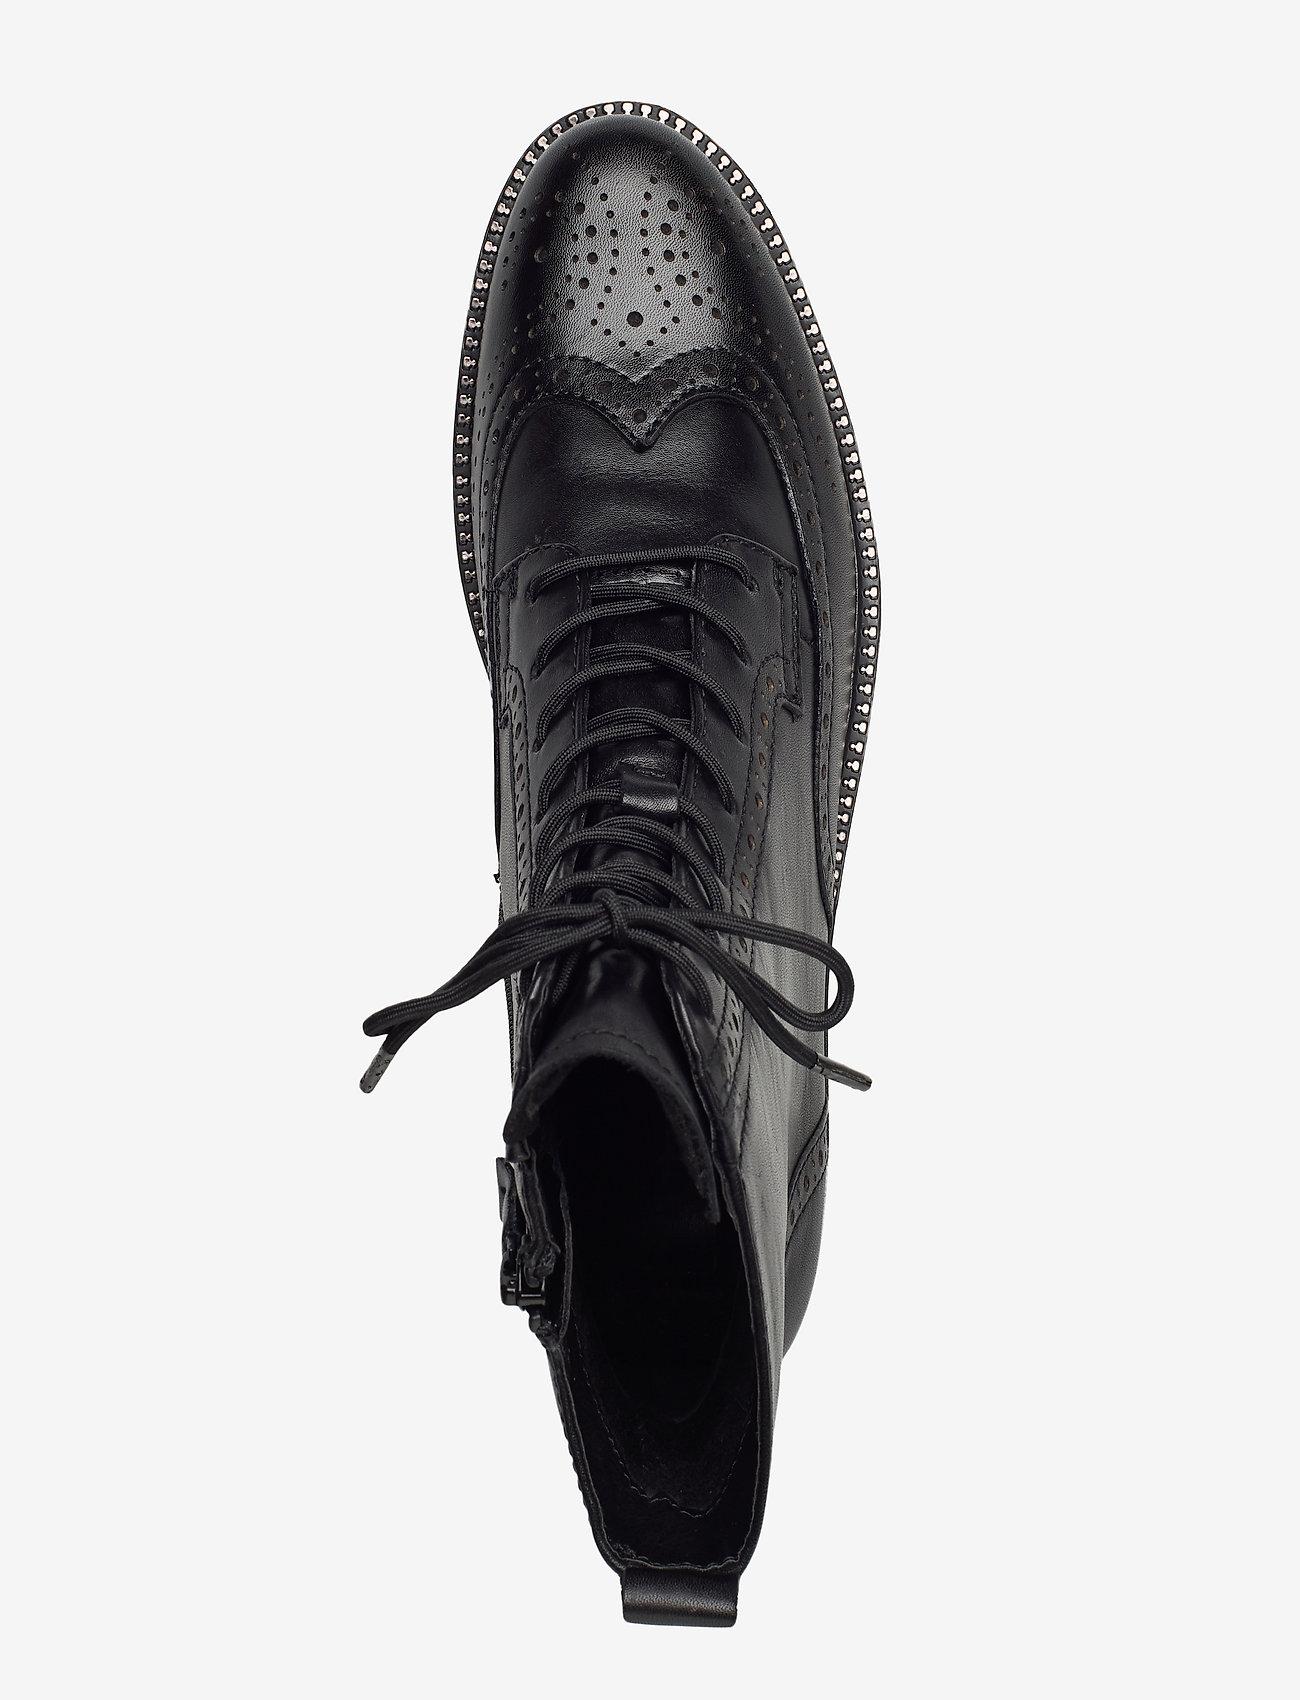 Woms Boots (Black) (99.95 €) - Tamaris lRtSi